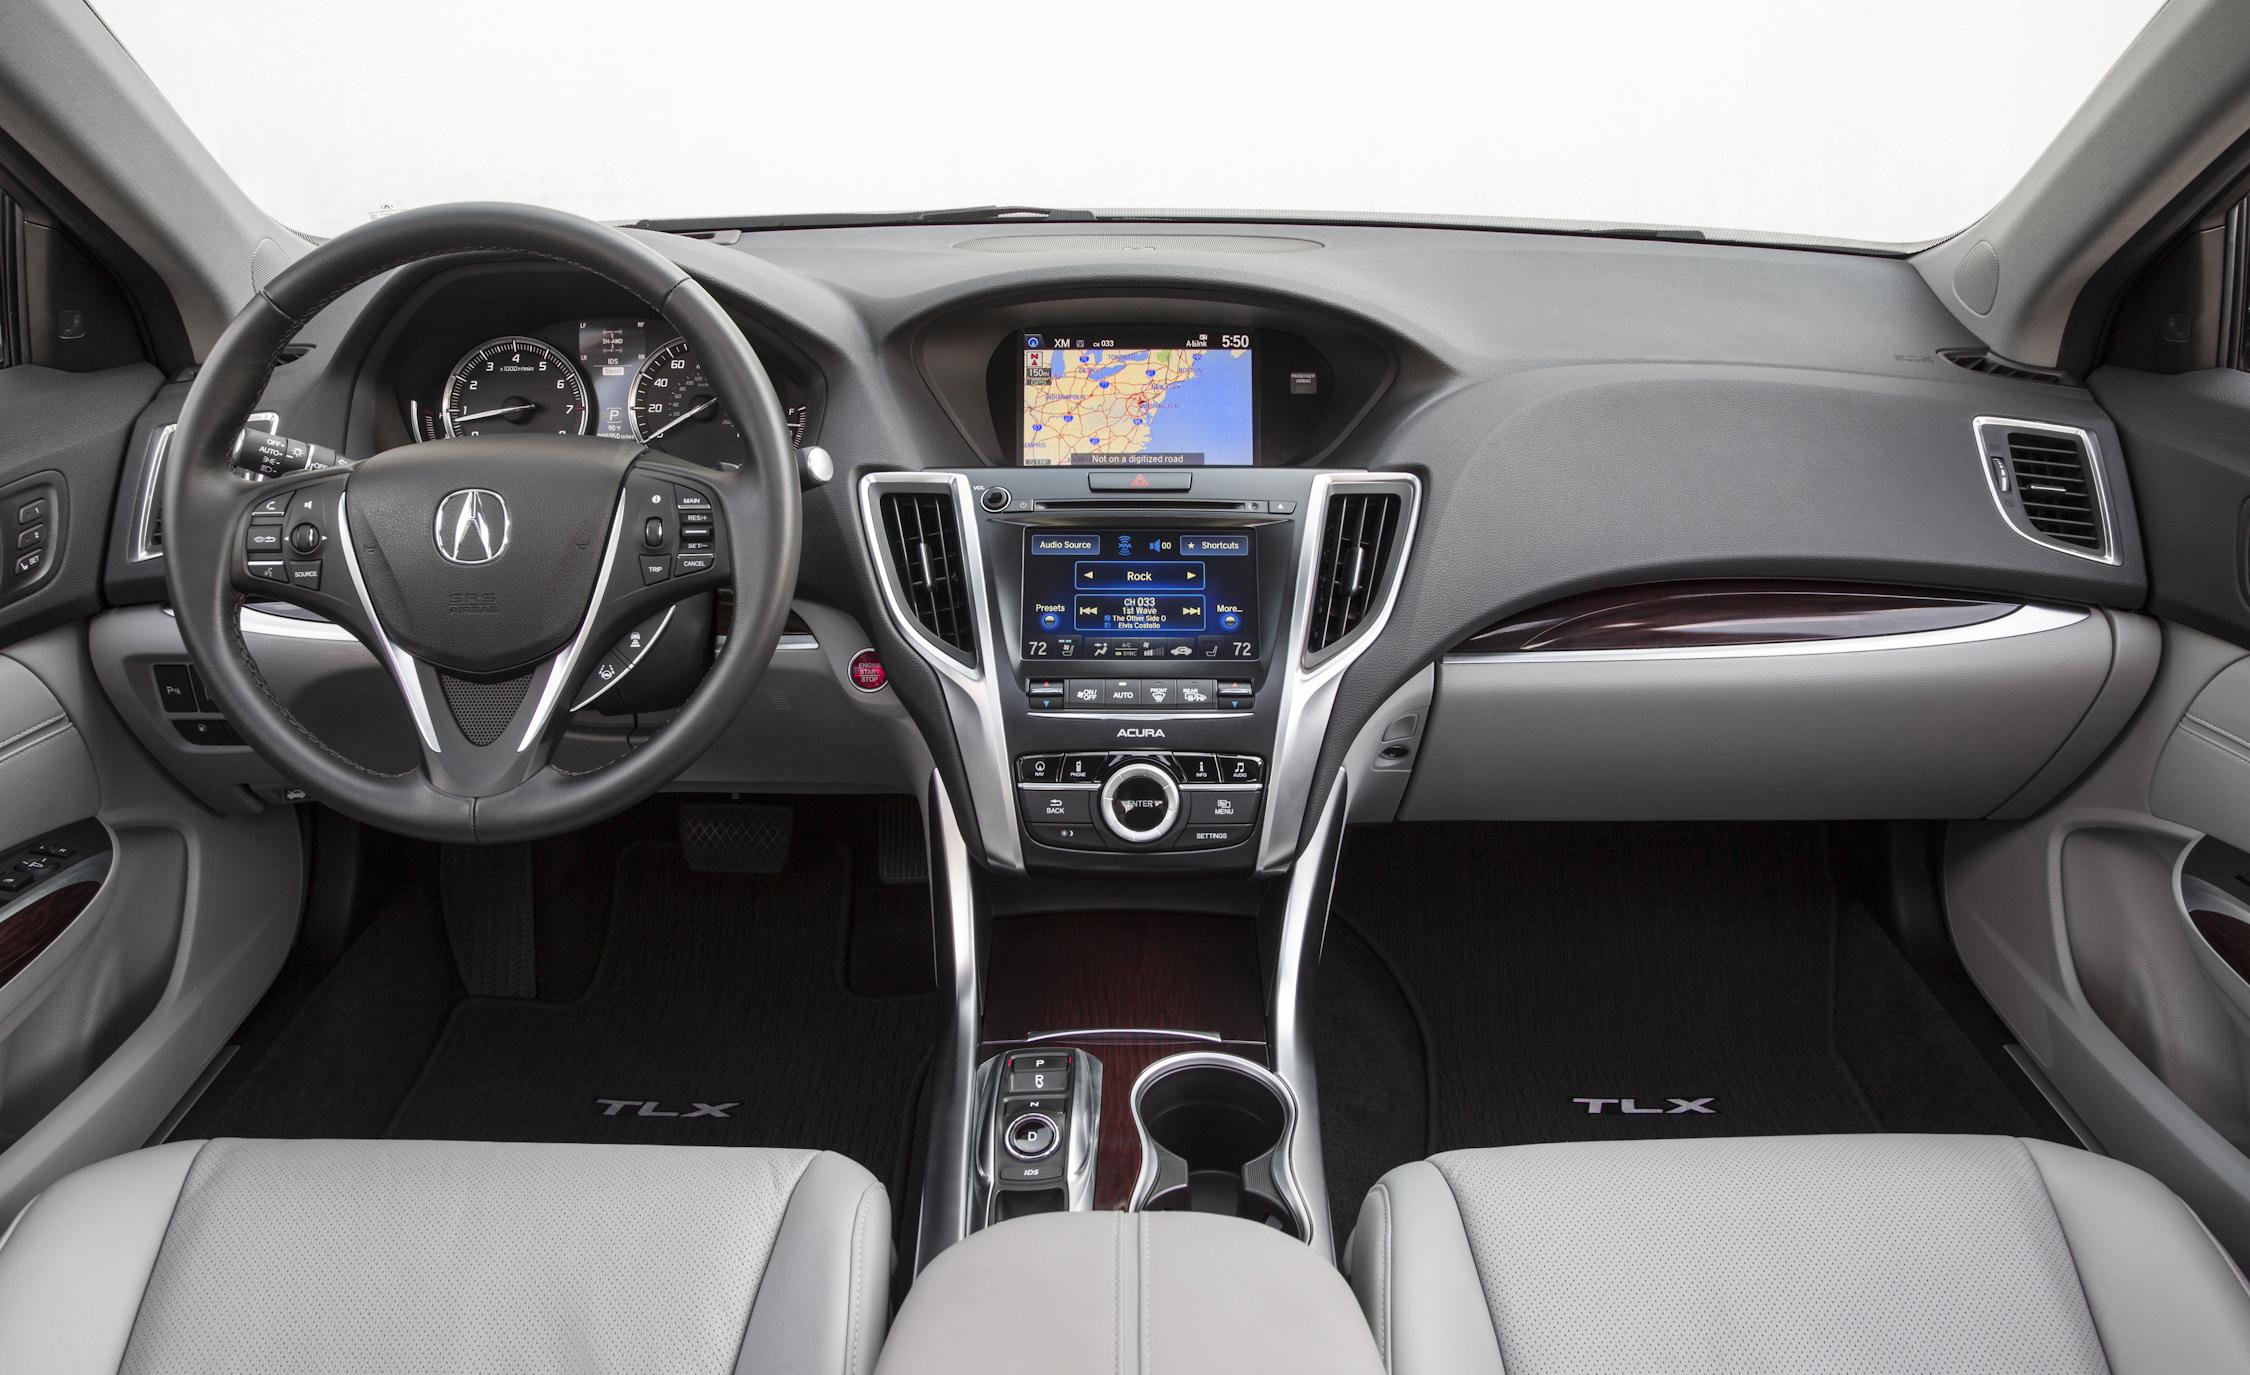 2015 Acura TLX 3.5L SH-AWD Interior Dashboard